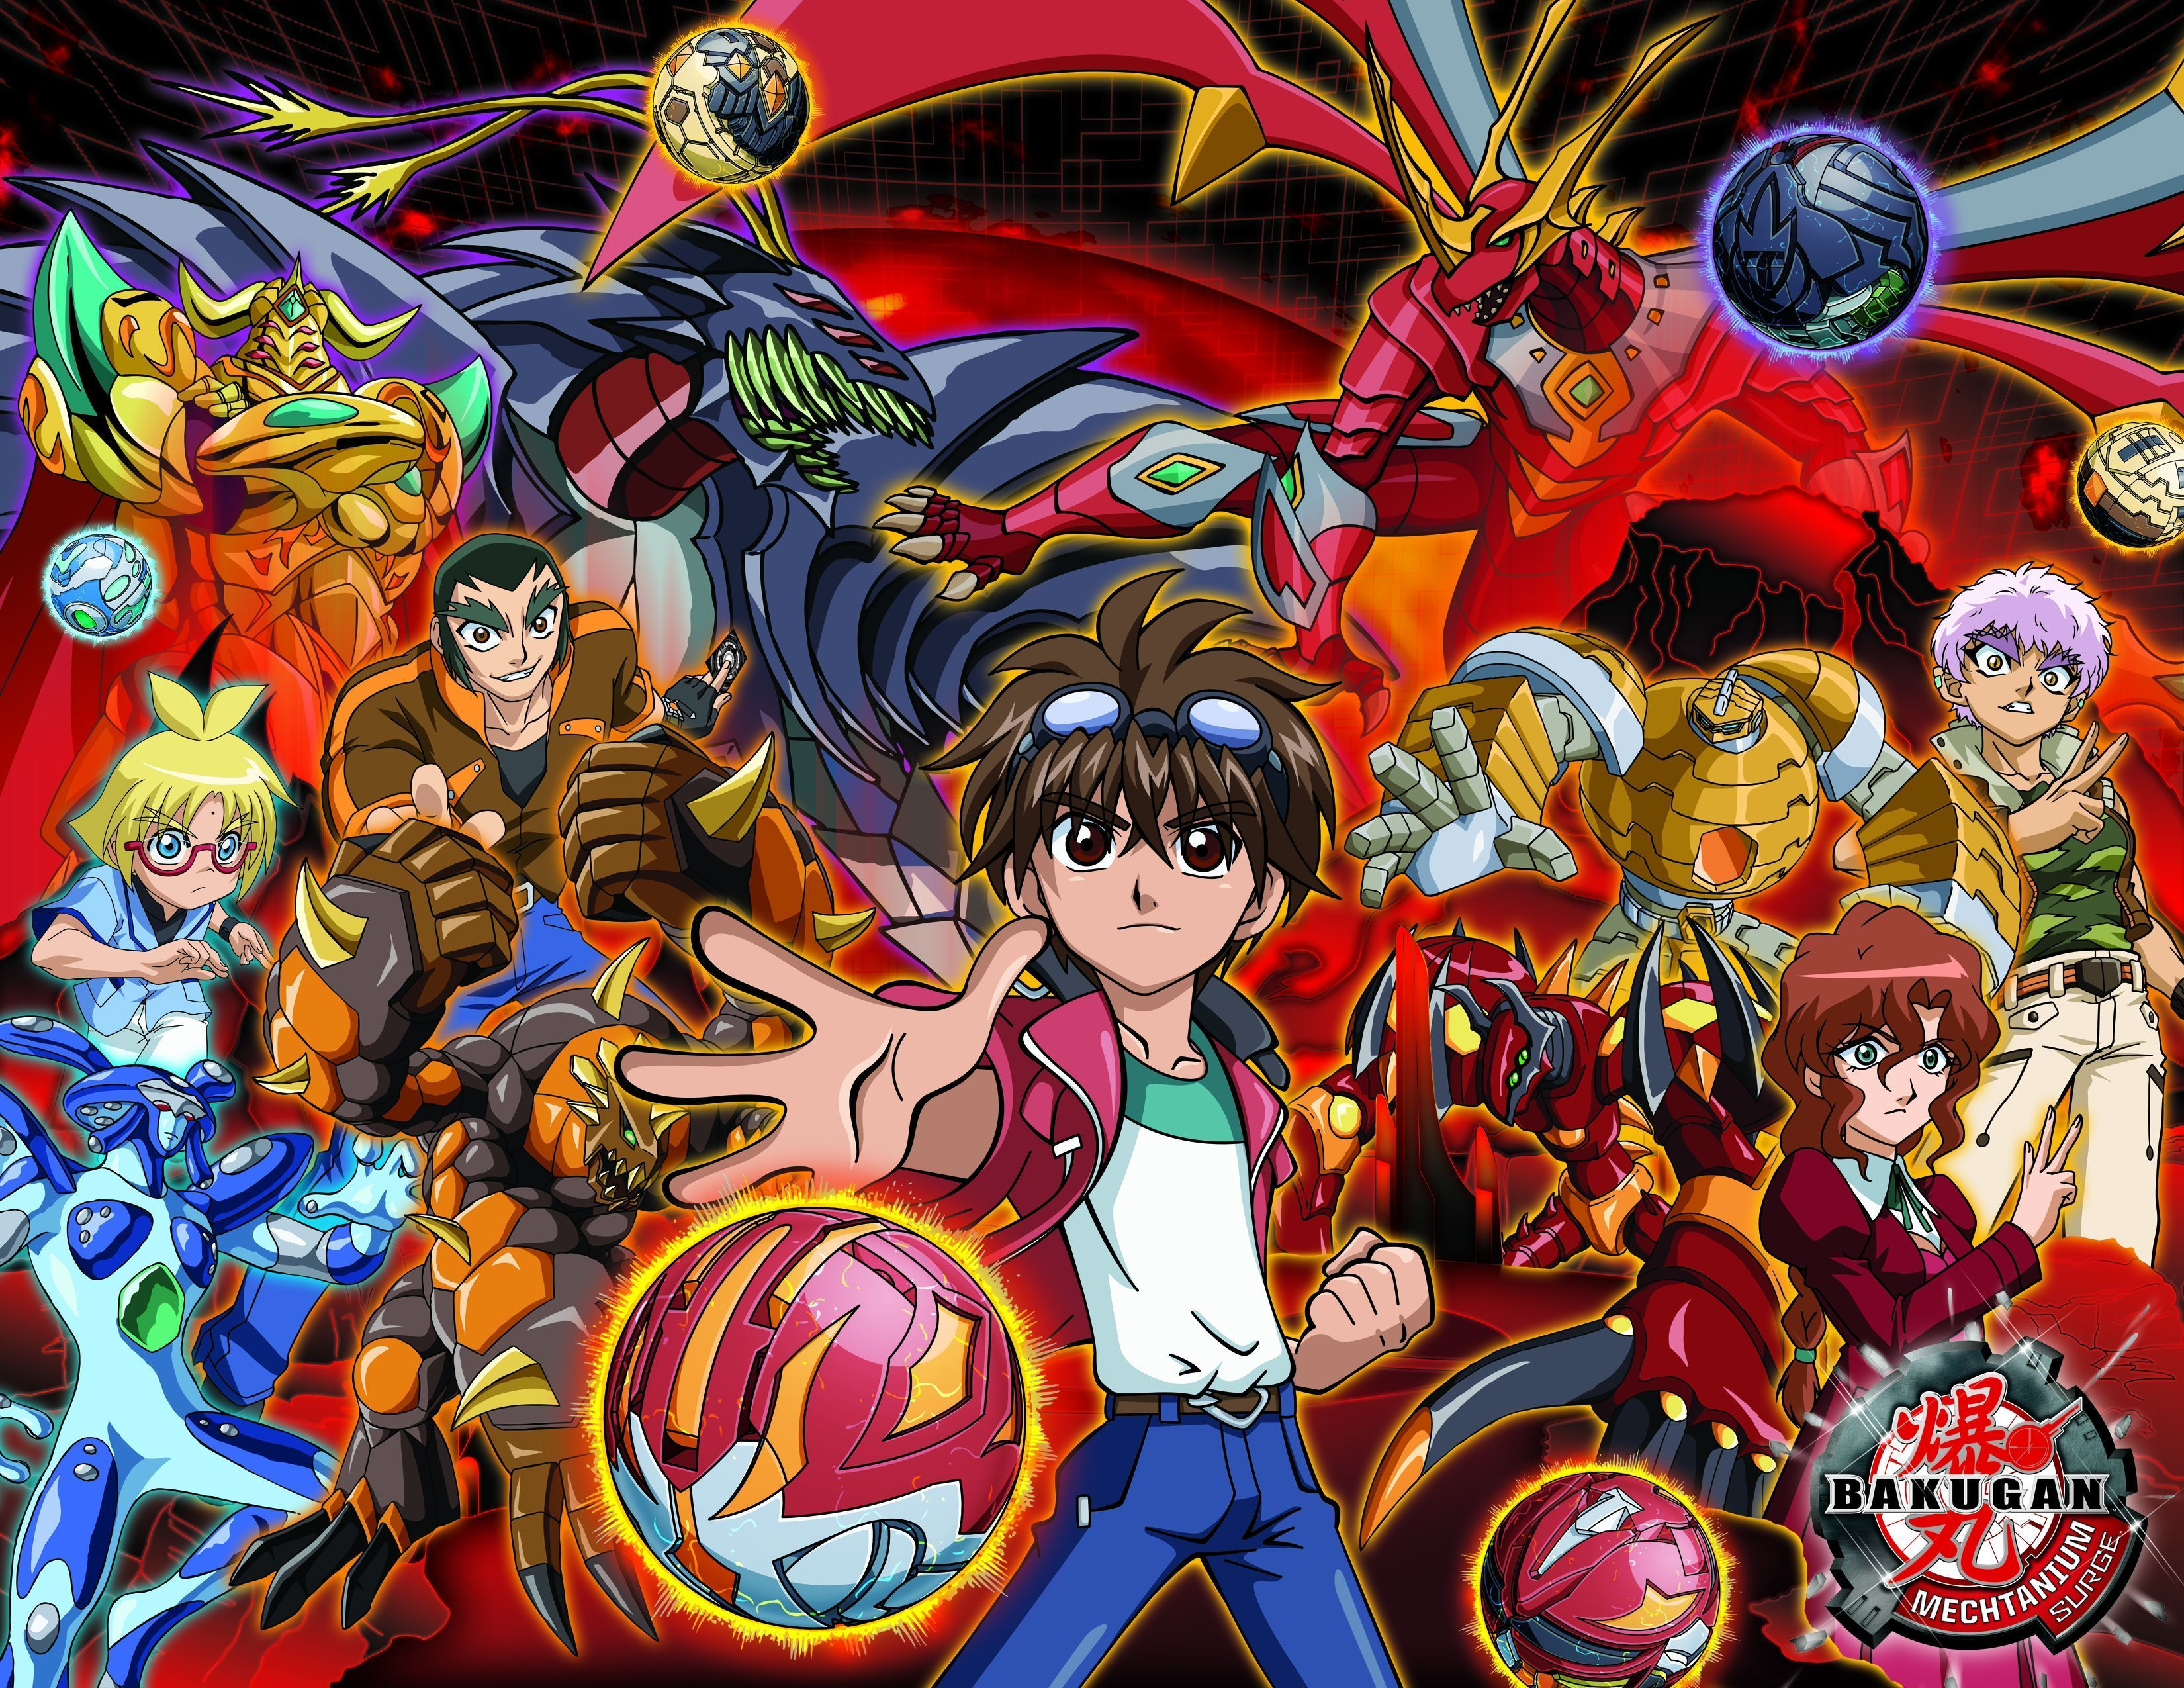 Bakugan battle brawlers img wide cartoons pinterest bakugan battle brawlers img wide voltagebd Gallery